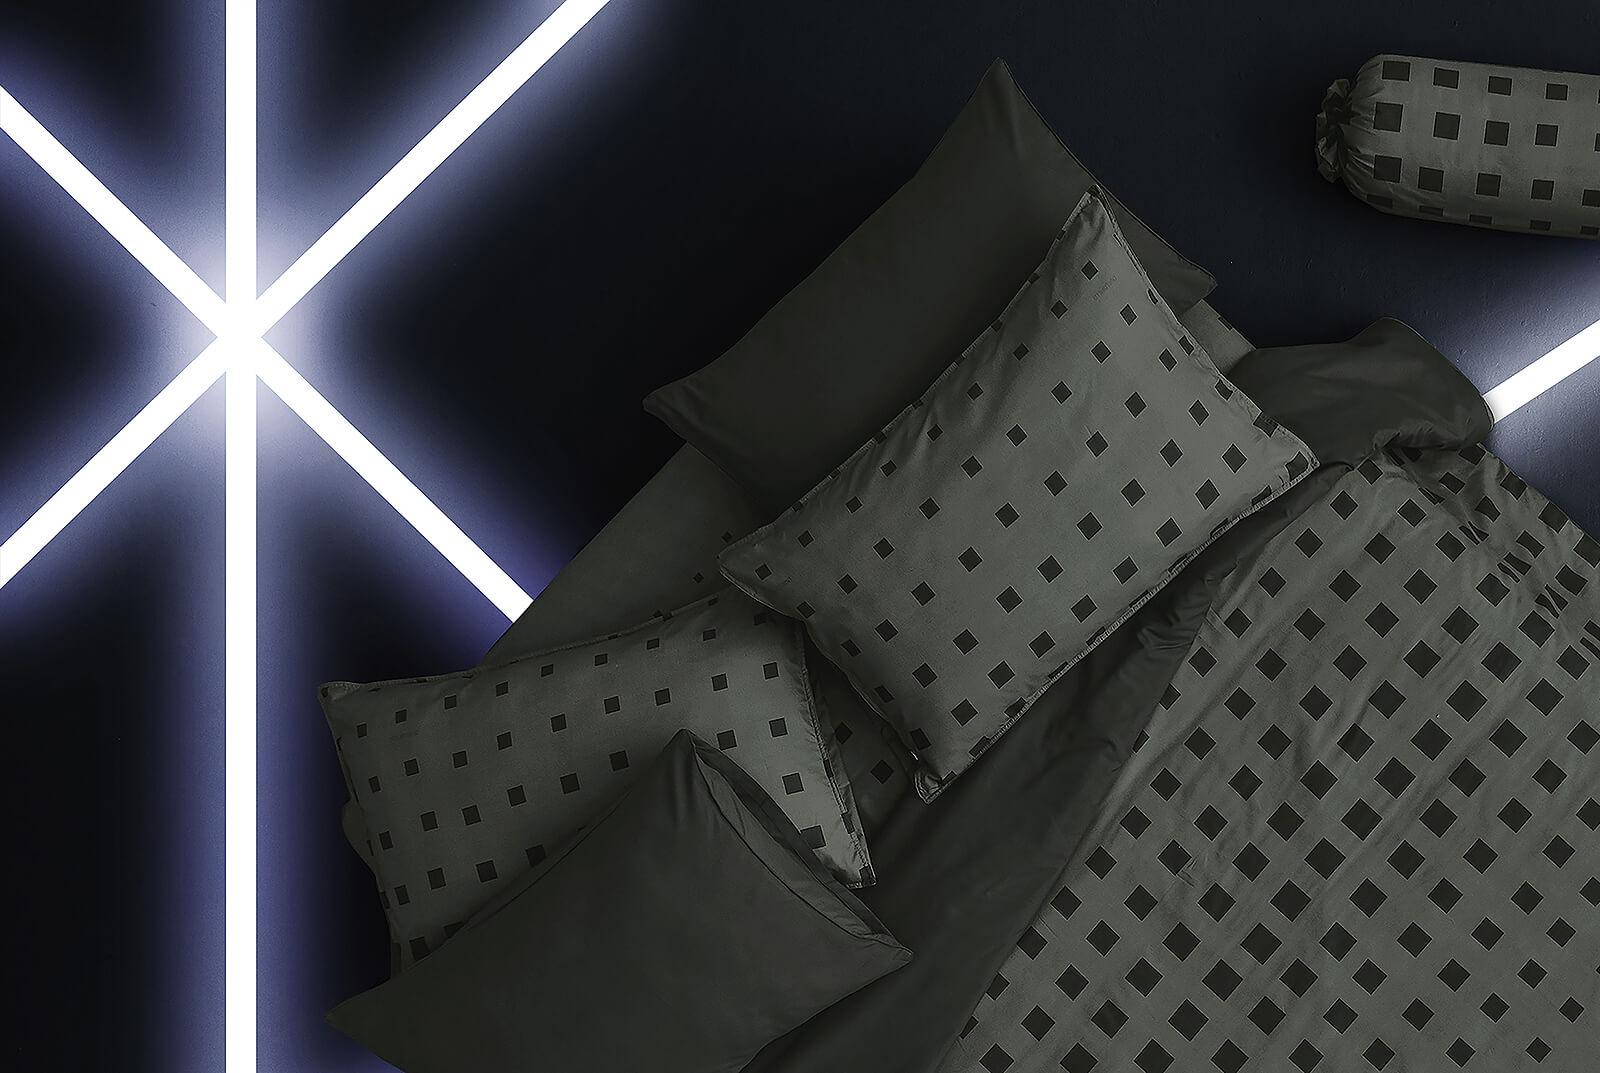 Dunlopillo รุ่น Stella ชุดผ้าปูที่นอน DL-SLATE GREY-S